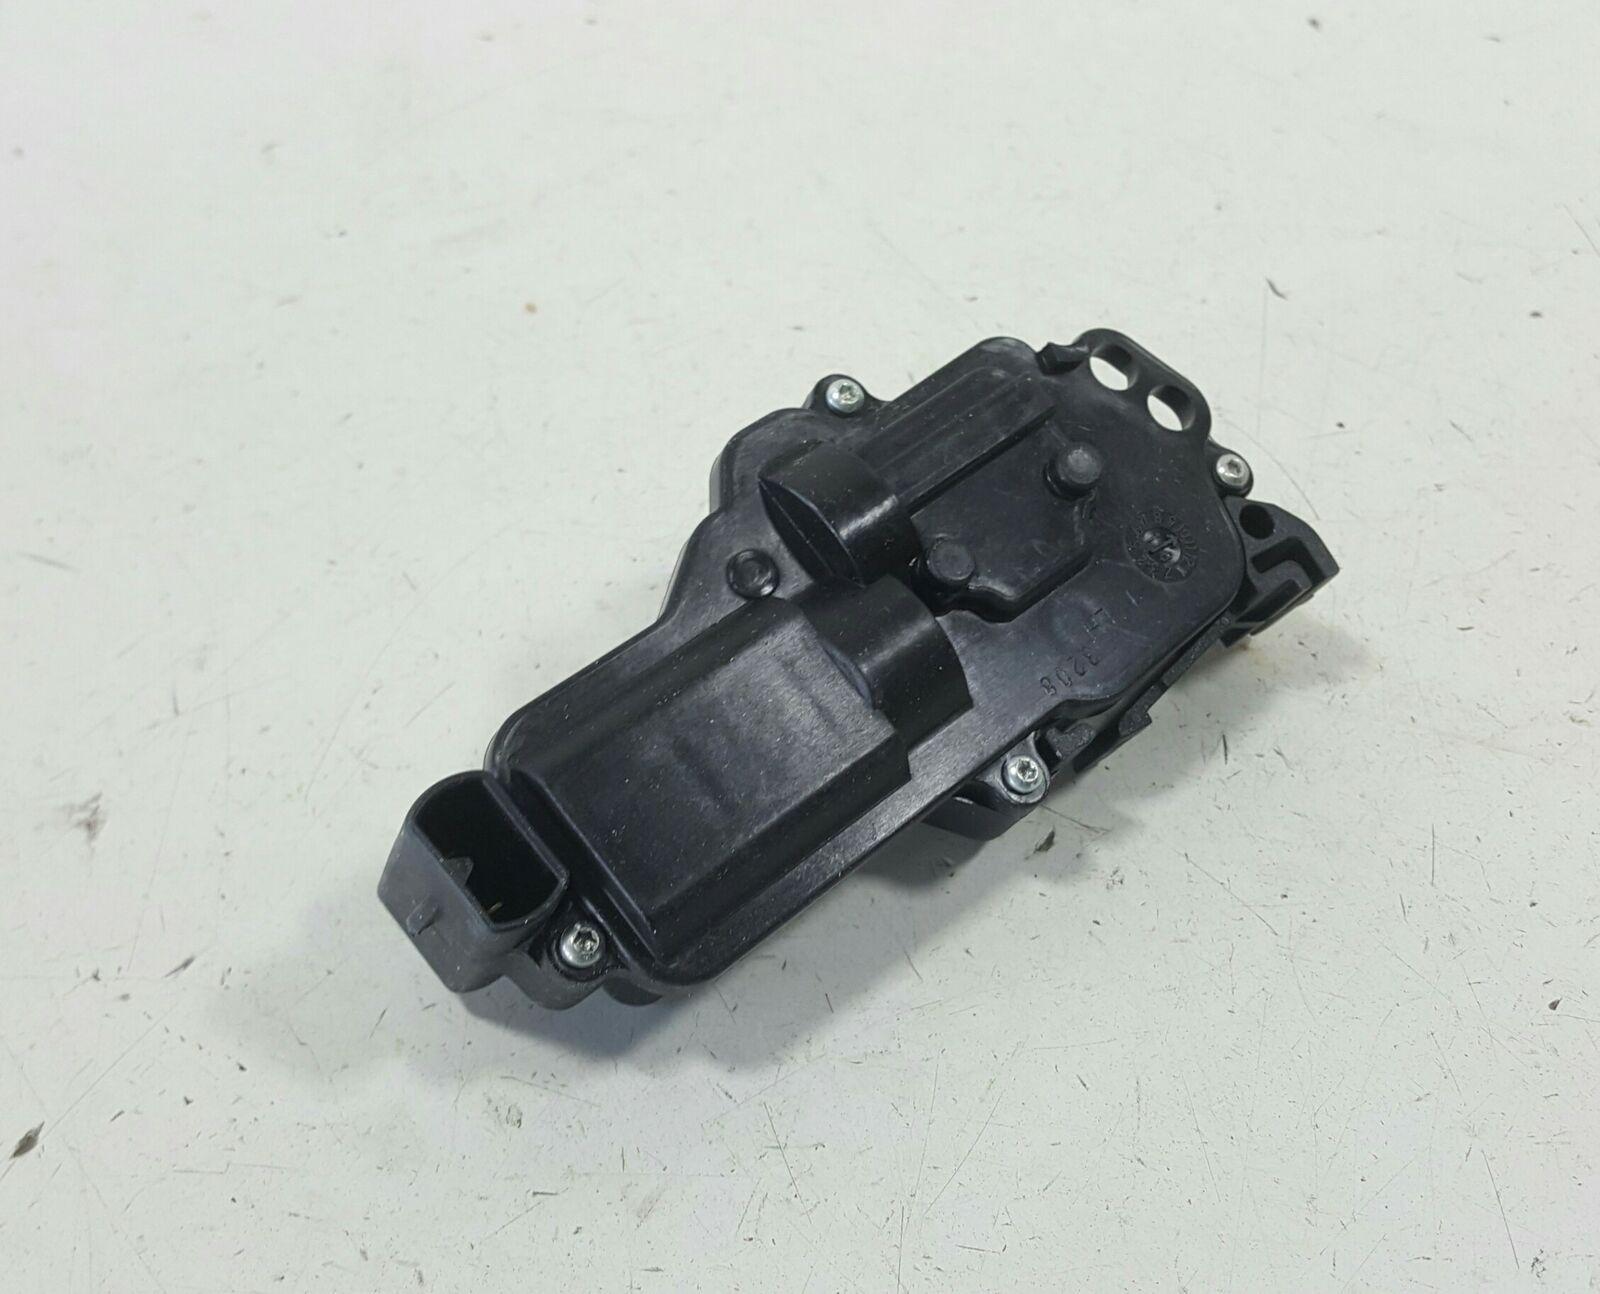 American Shifter 525284 Shifter 4L80E 23 E Brake Trim Kit for F465A